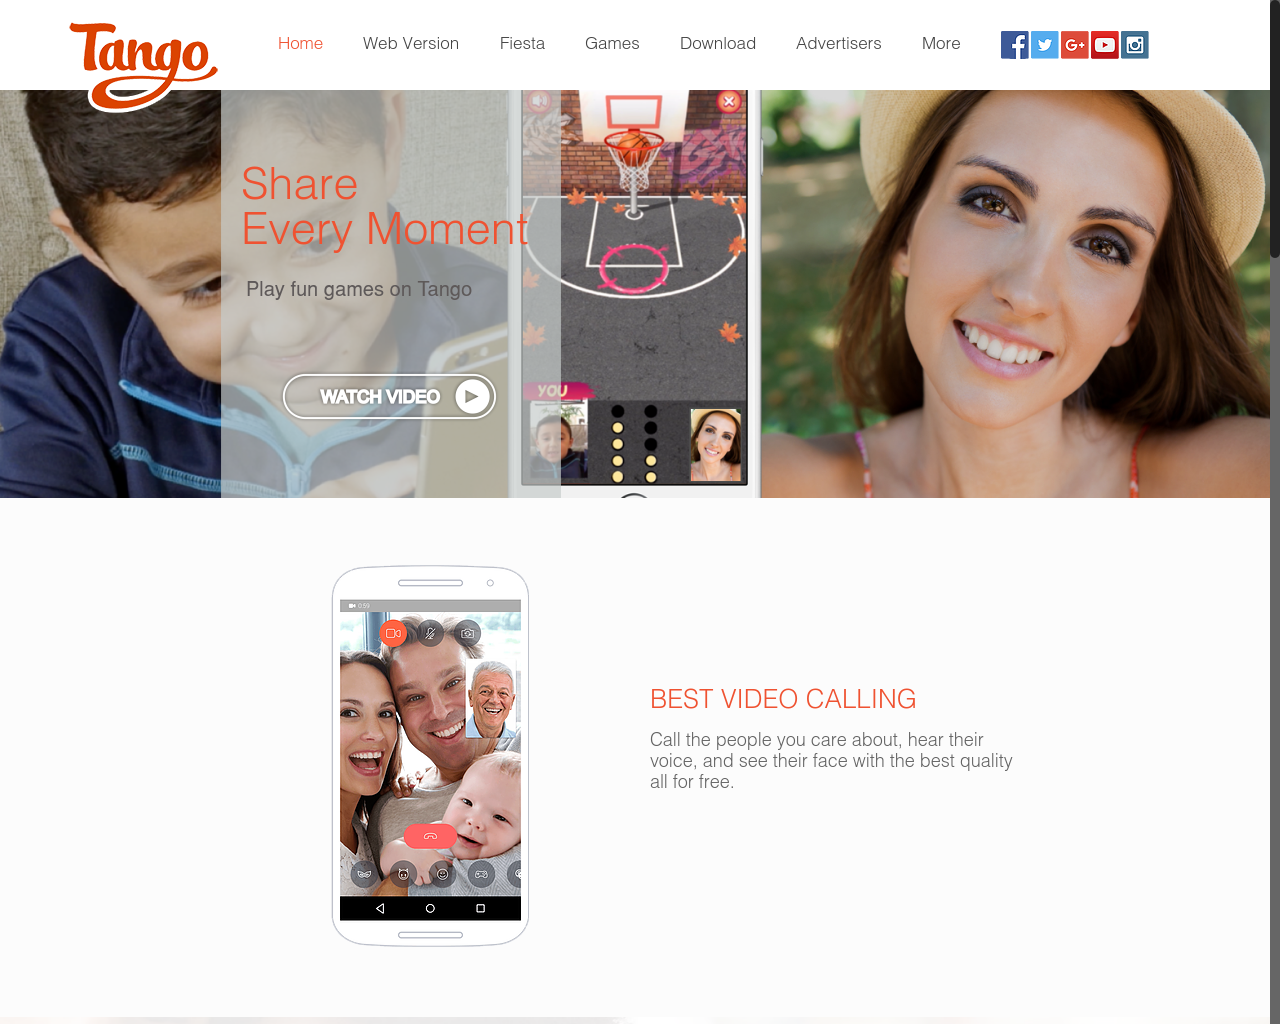 Tango-Me-Advertising-Reviews-Pricing